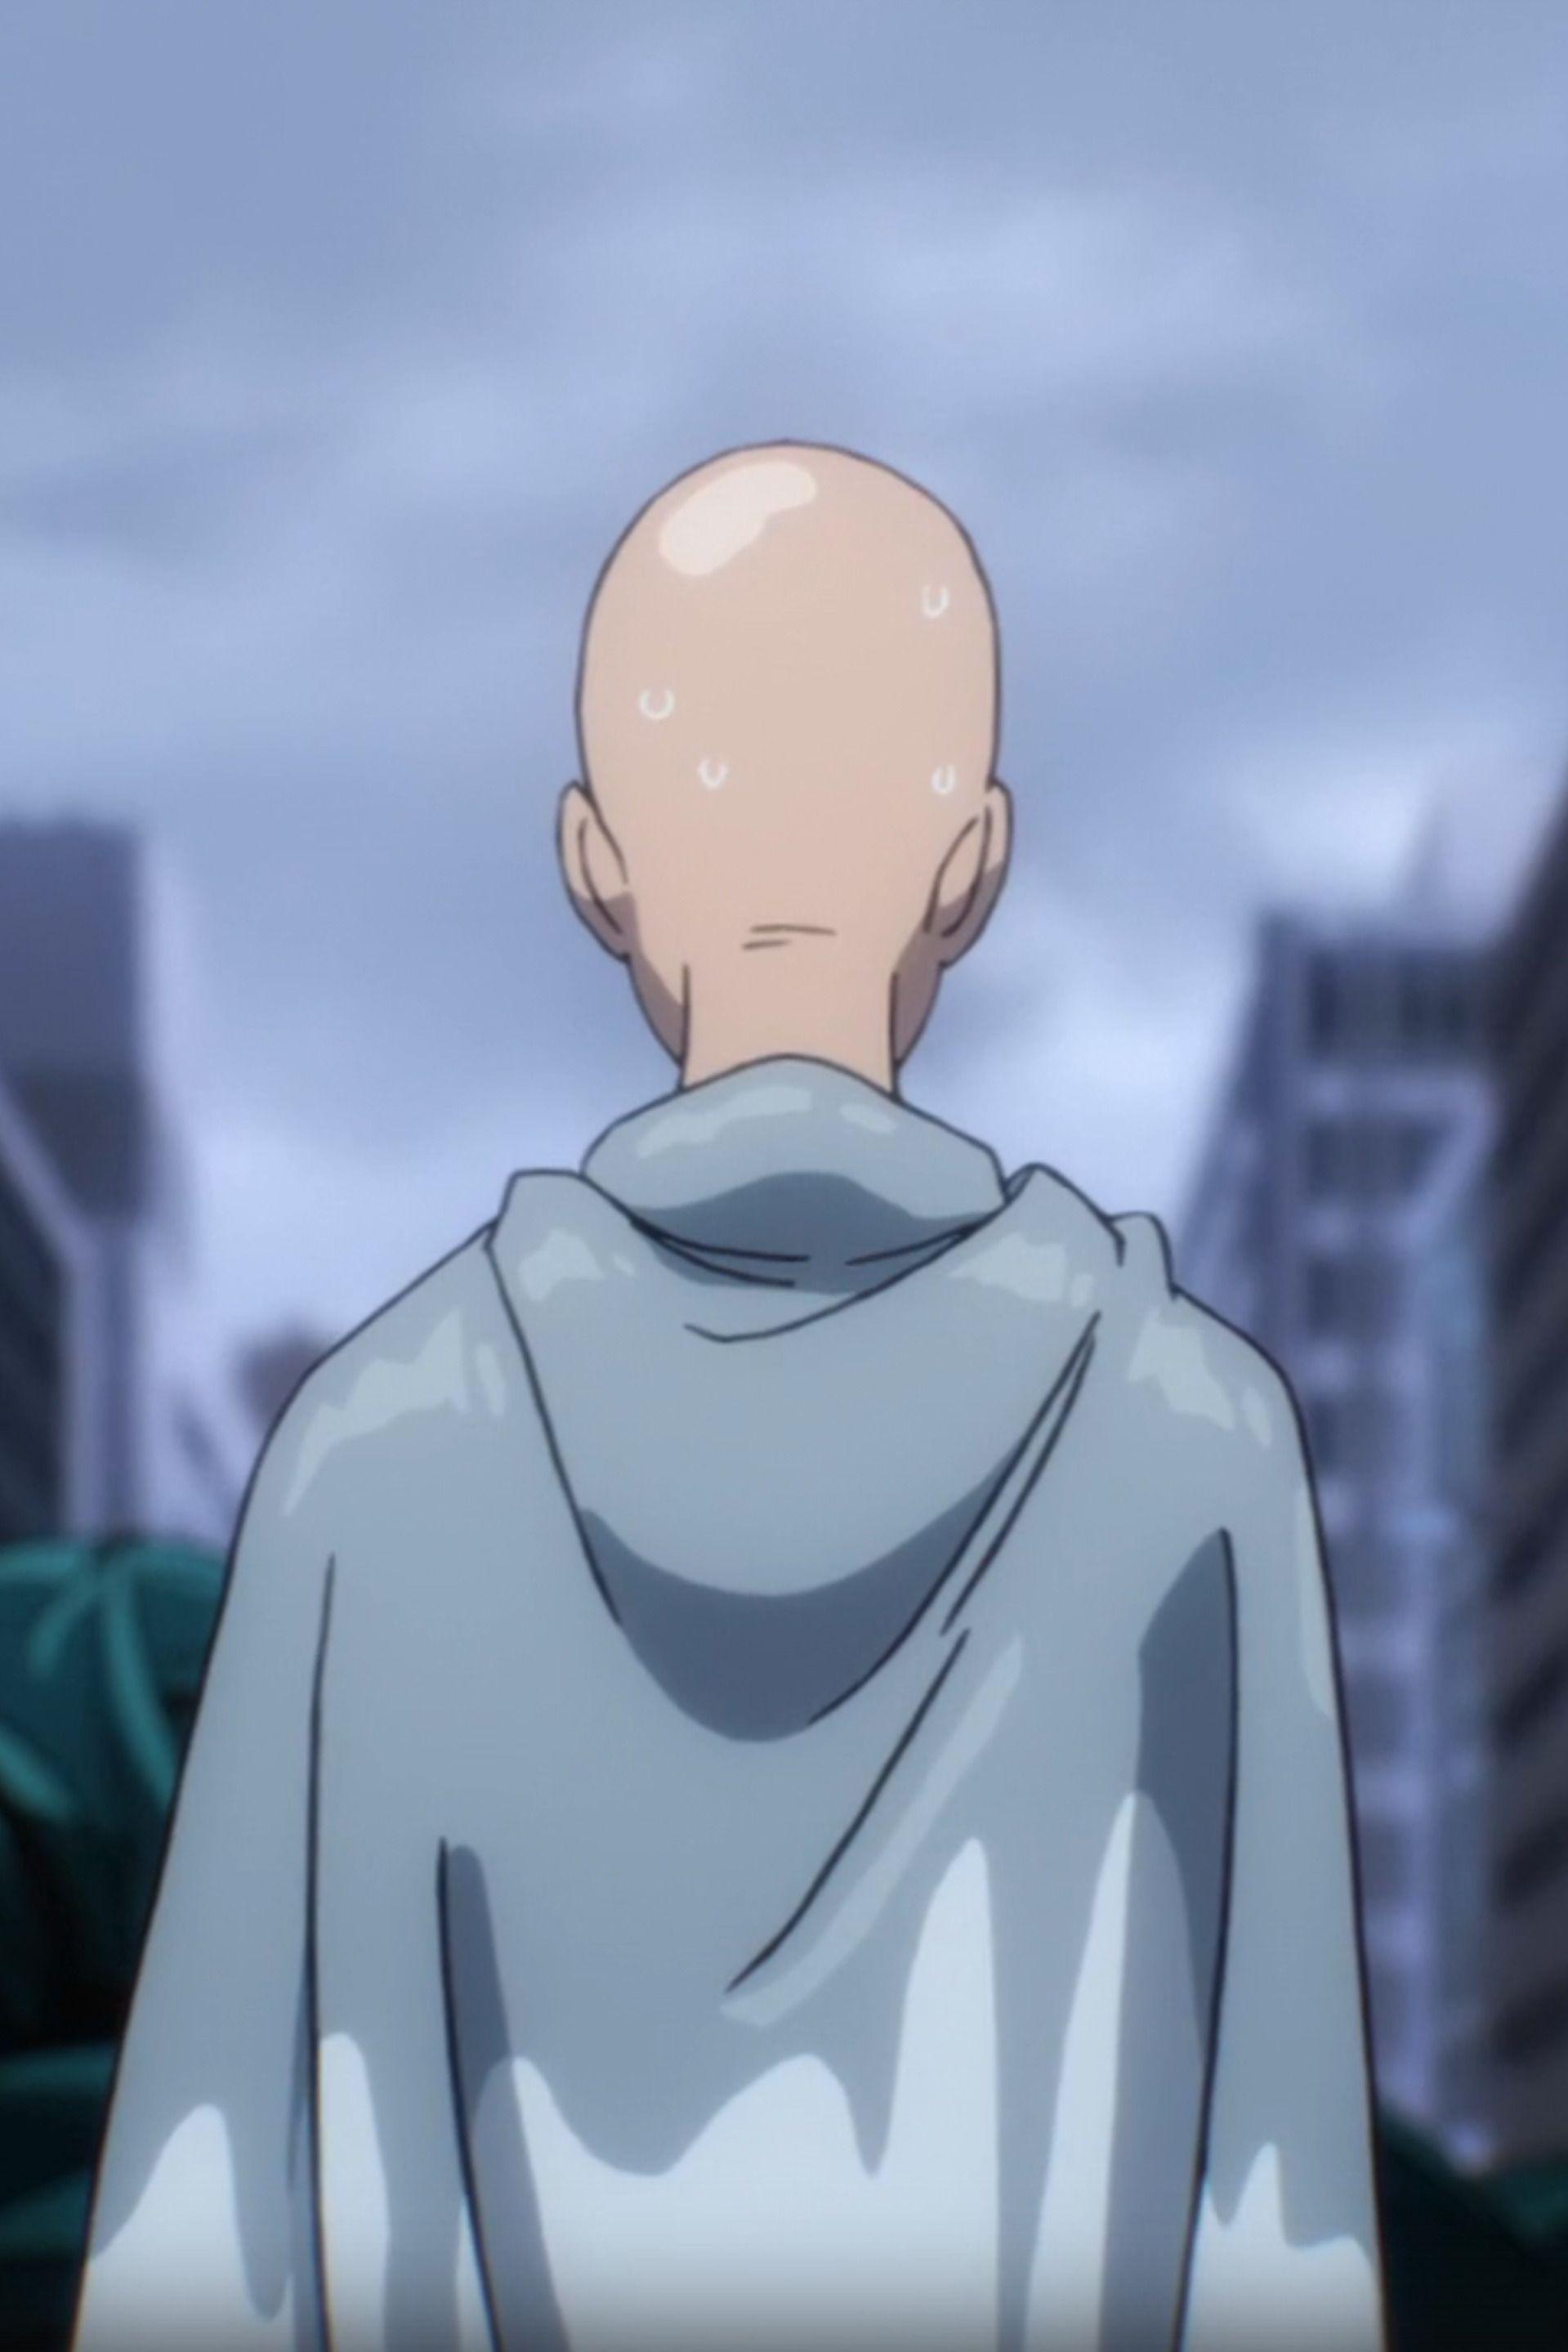 Pin de Anime, Games, other en Anime Tokyo ghoul y Trucos